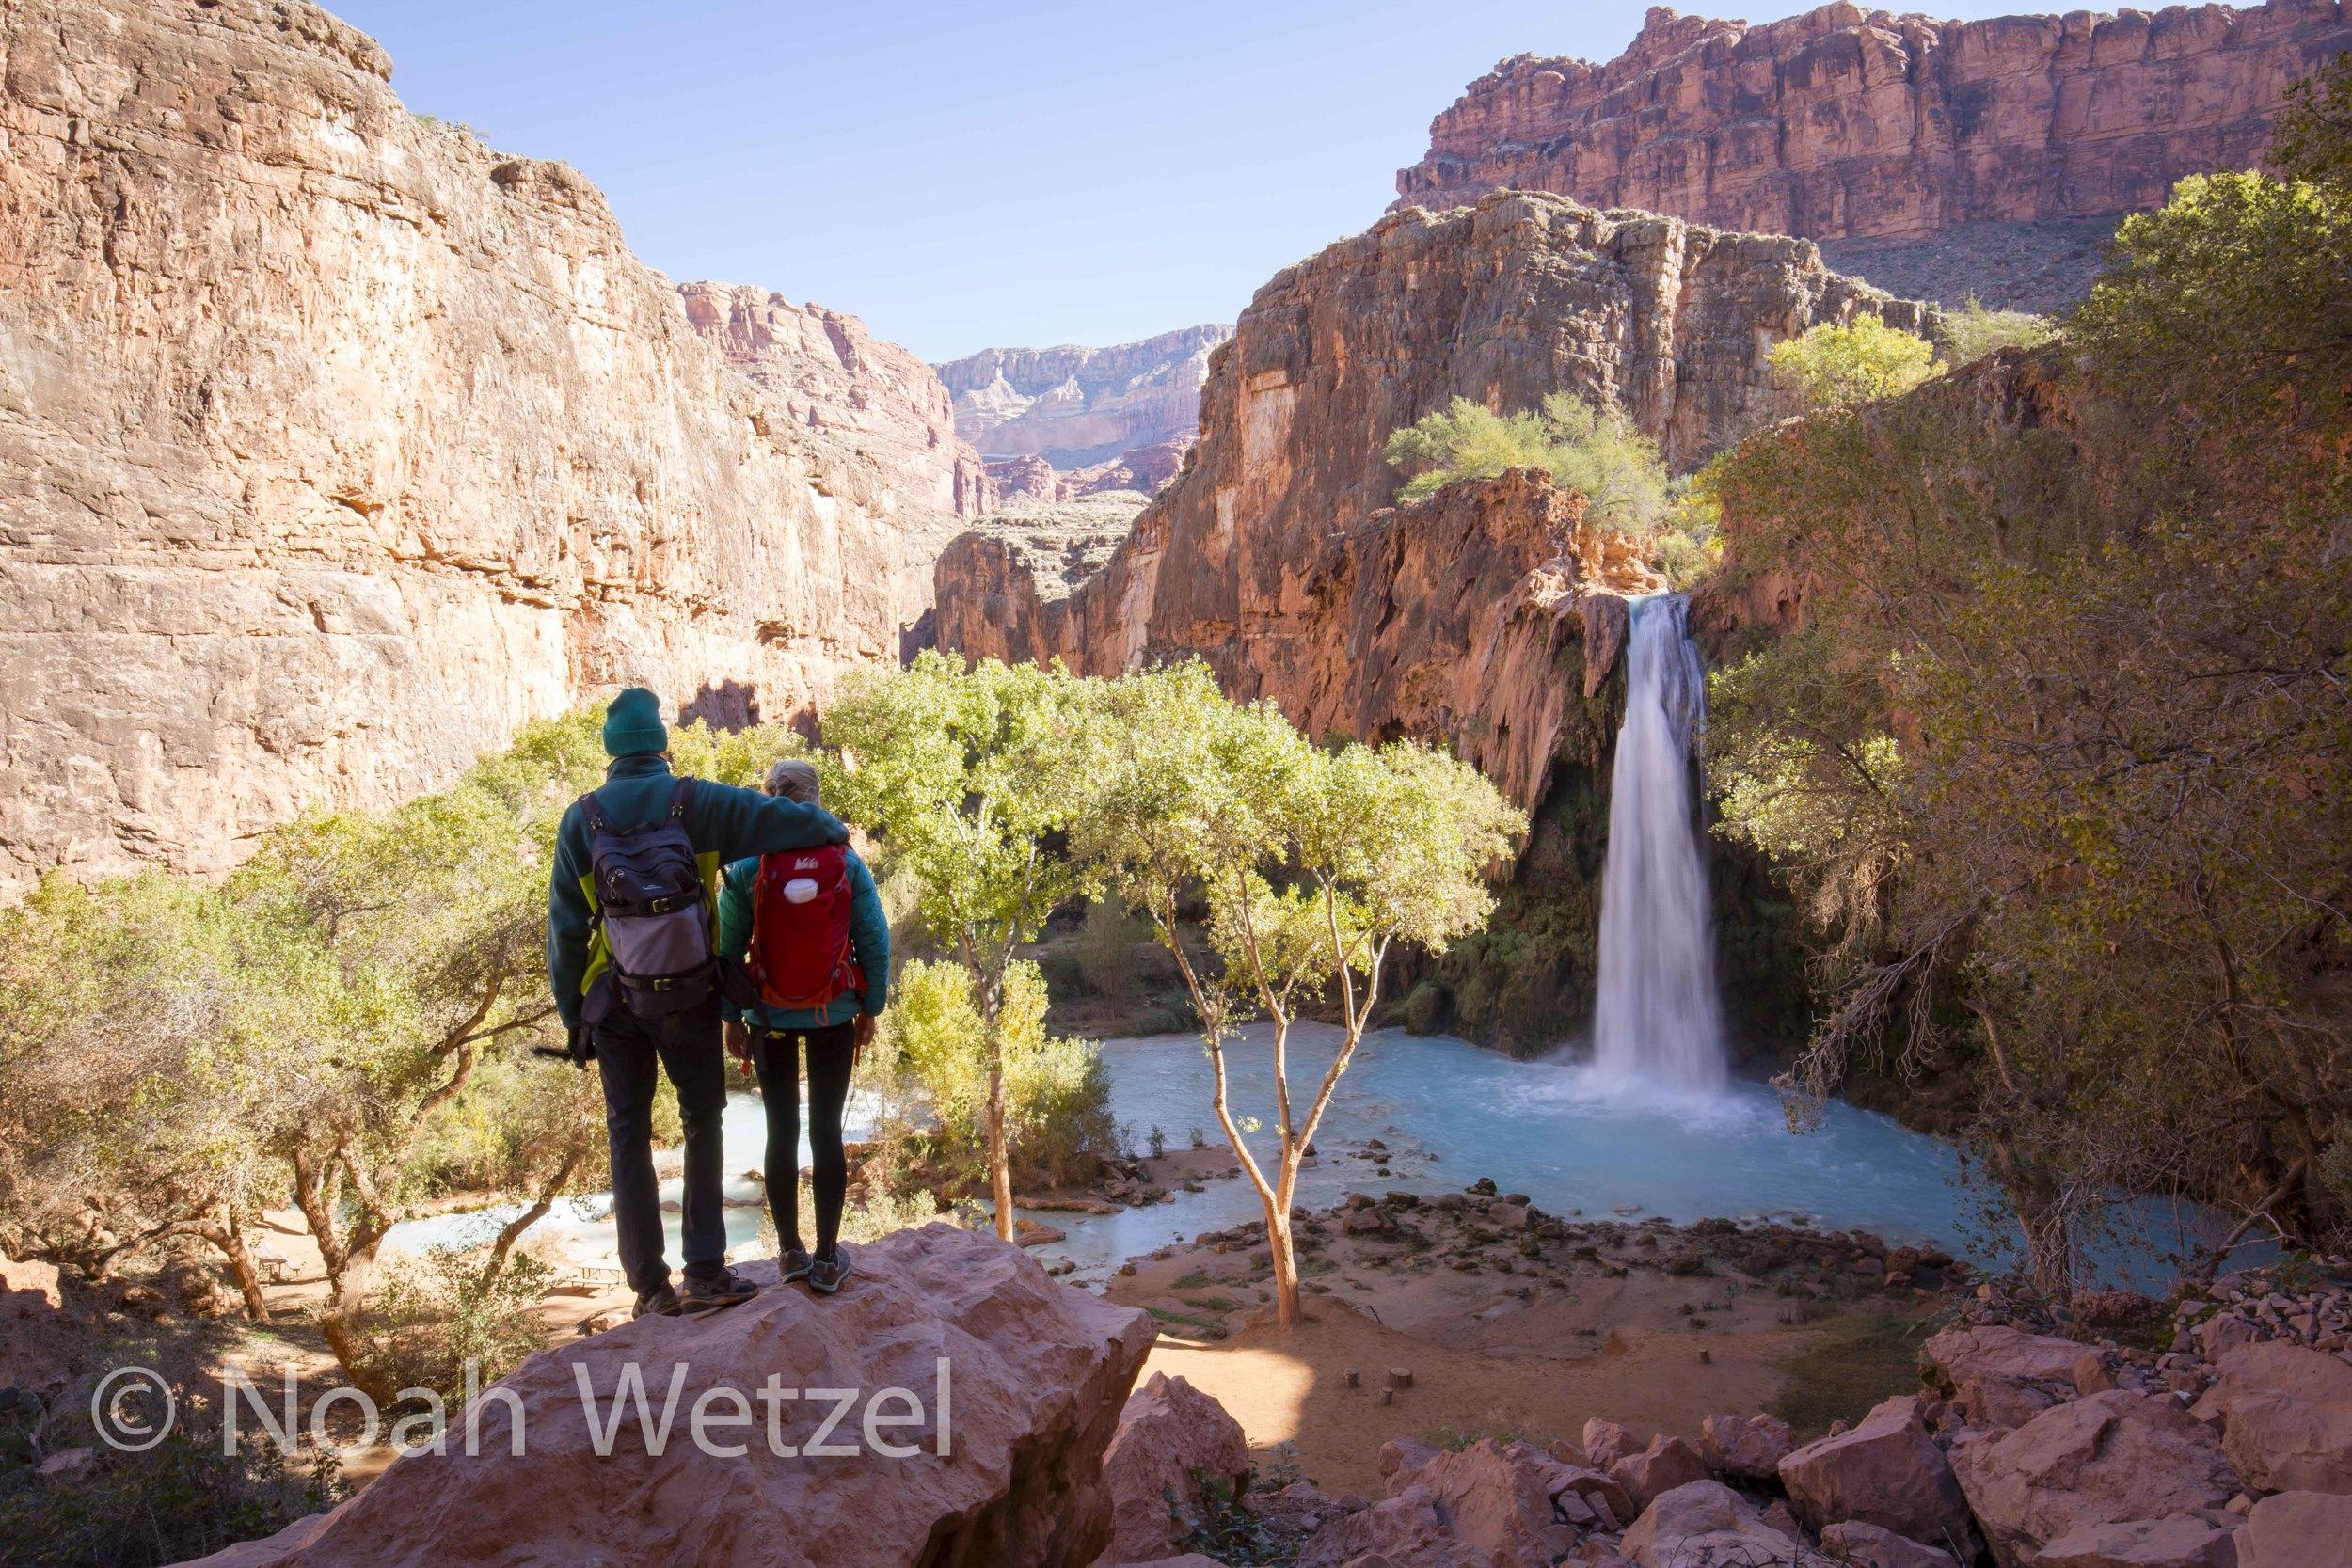 Jerome and Rachel overlooking Havasu Falls in Supai, Arizona